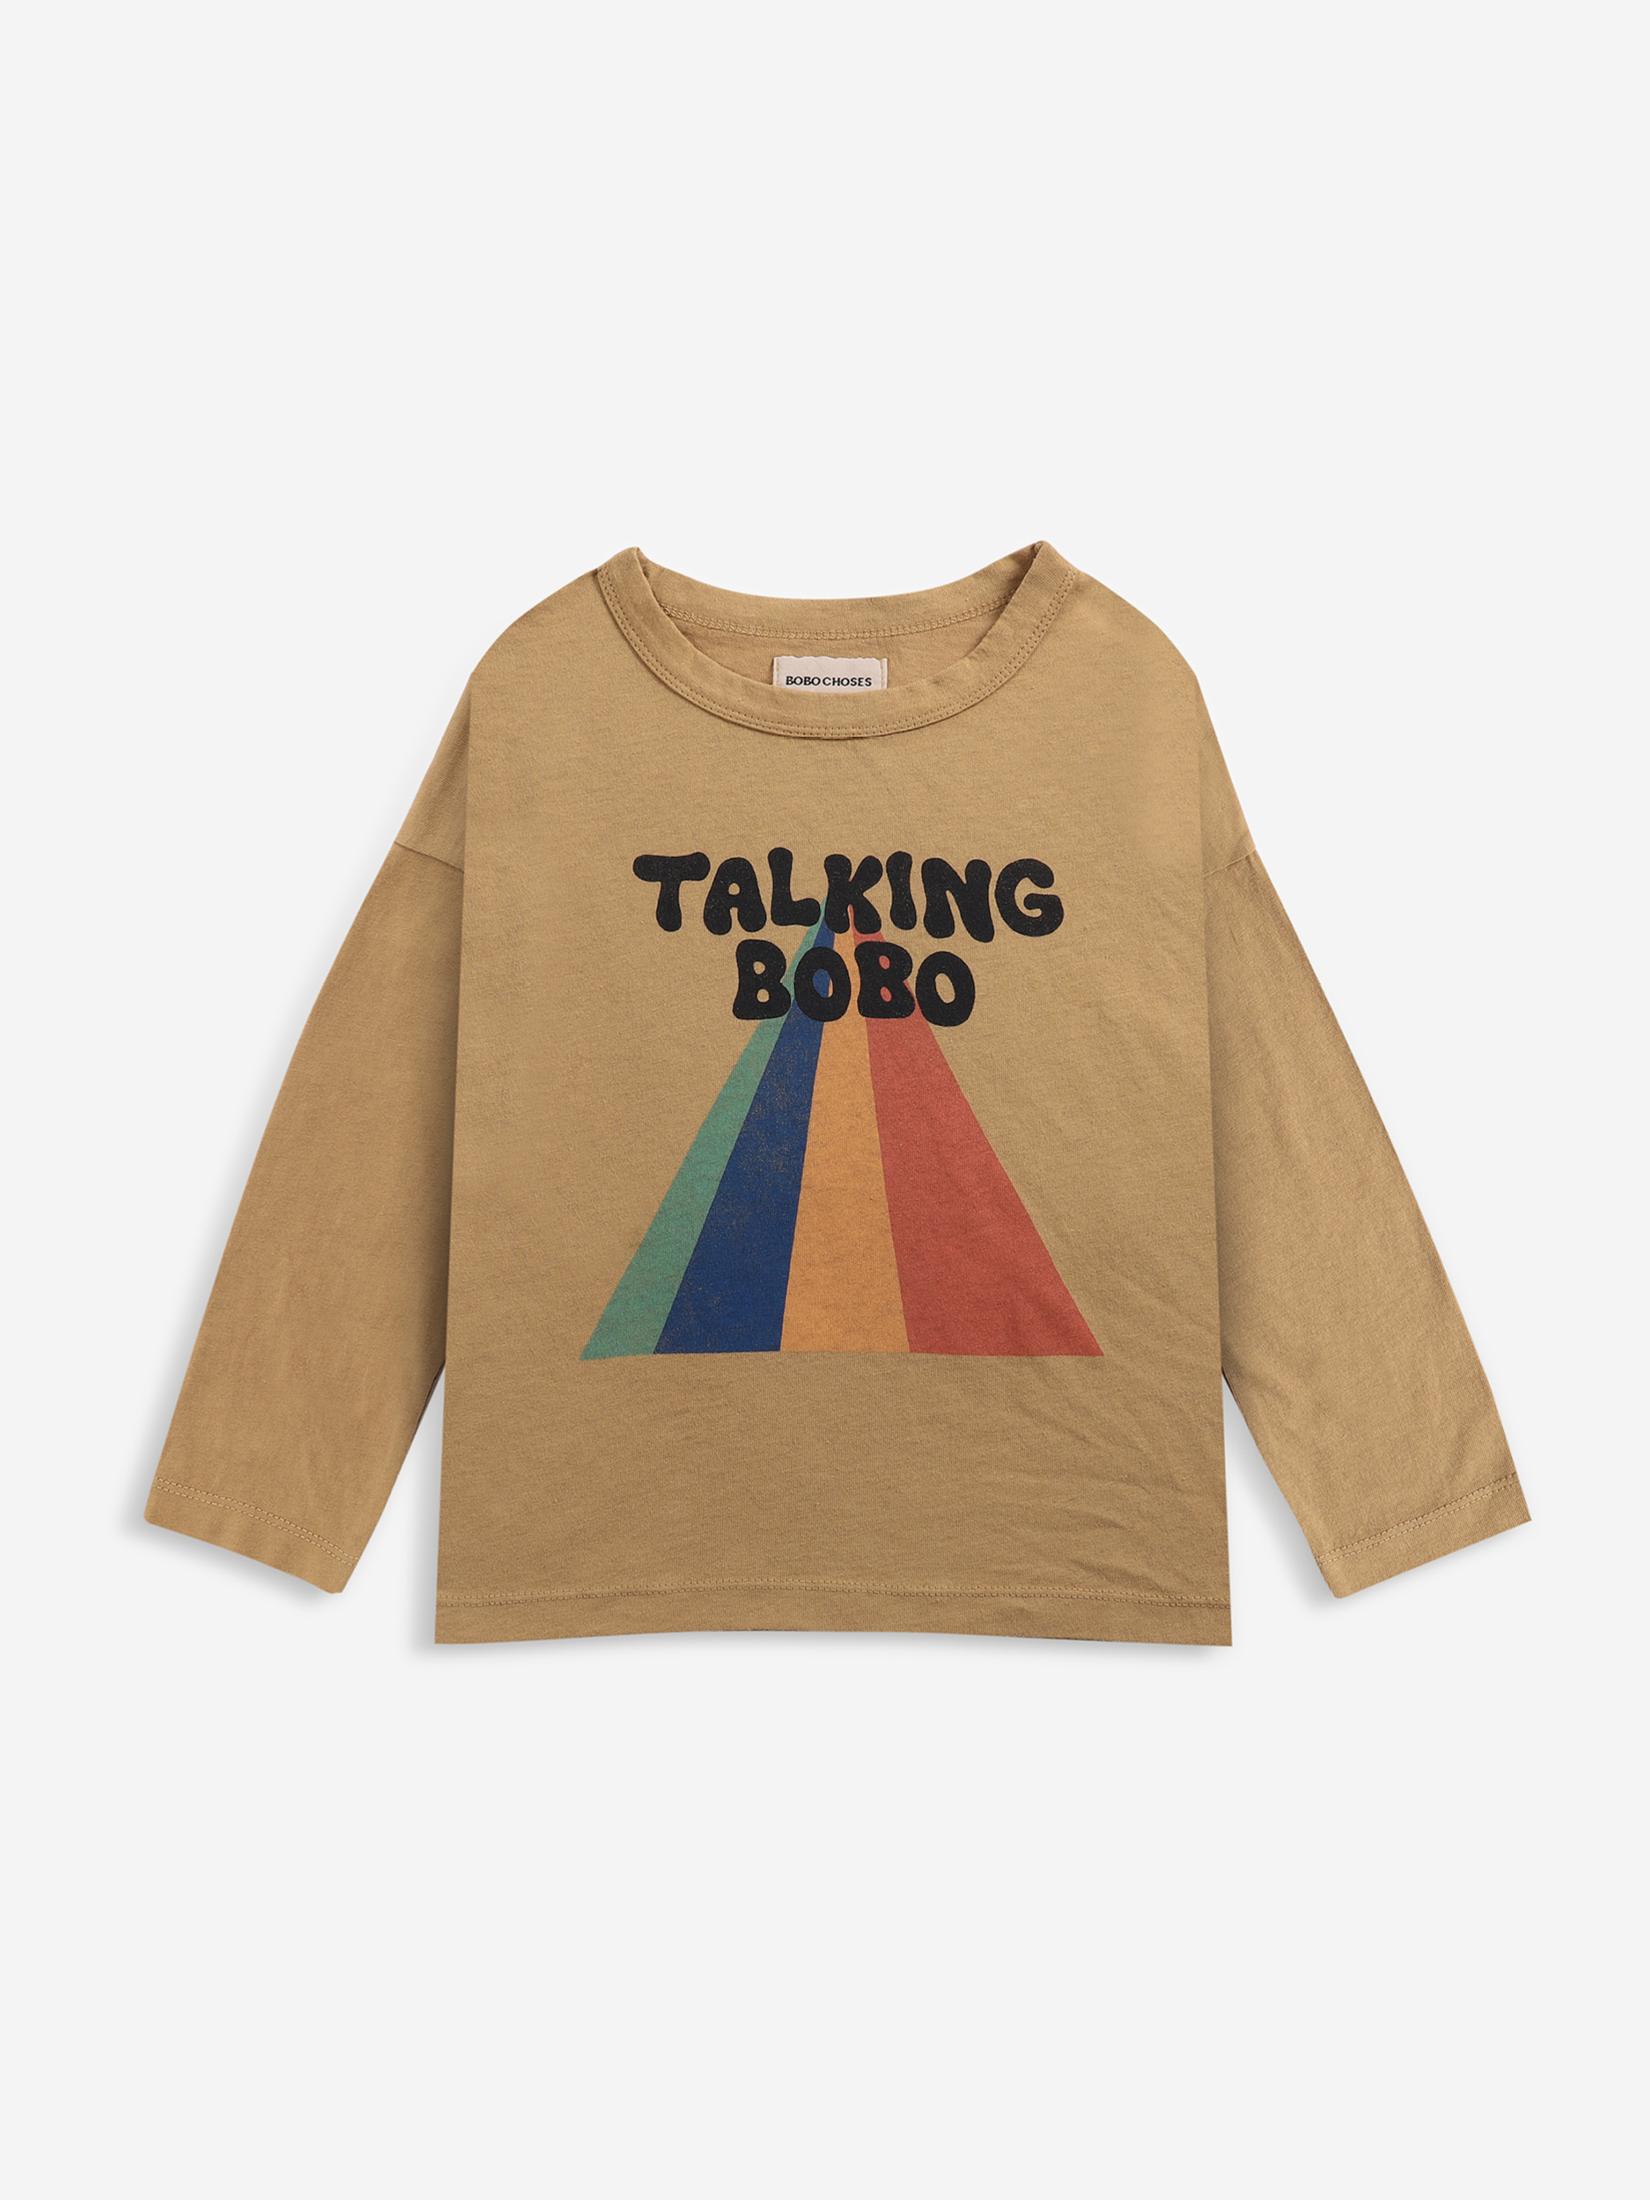 【BOBOCHOSES】Drop1/221AC011 Talking Bobo Rainbow long sleeve T-shirt KID